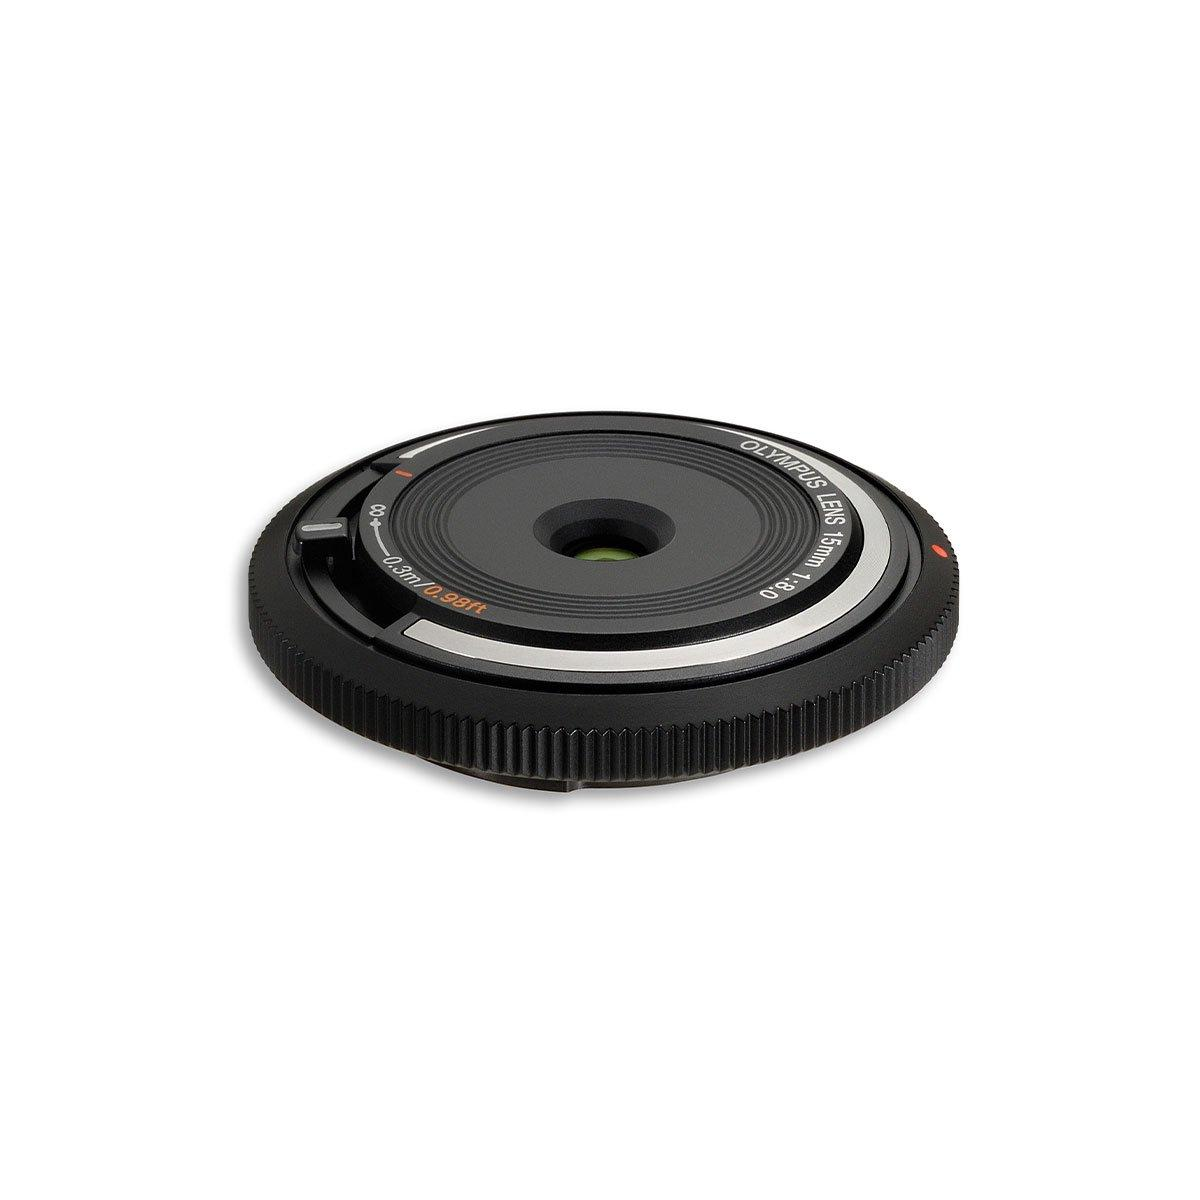 Olympus Body cap lens 15mm F8.0 musta